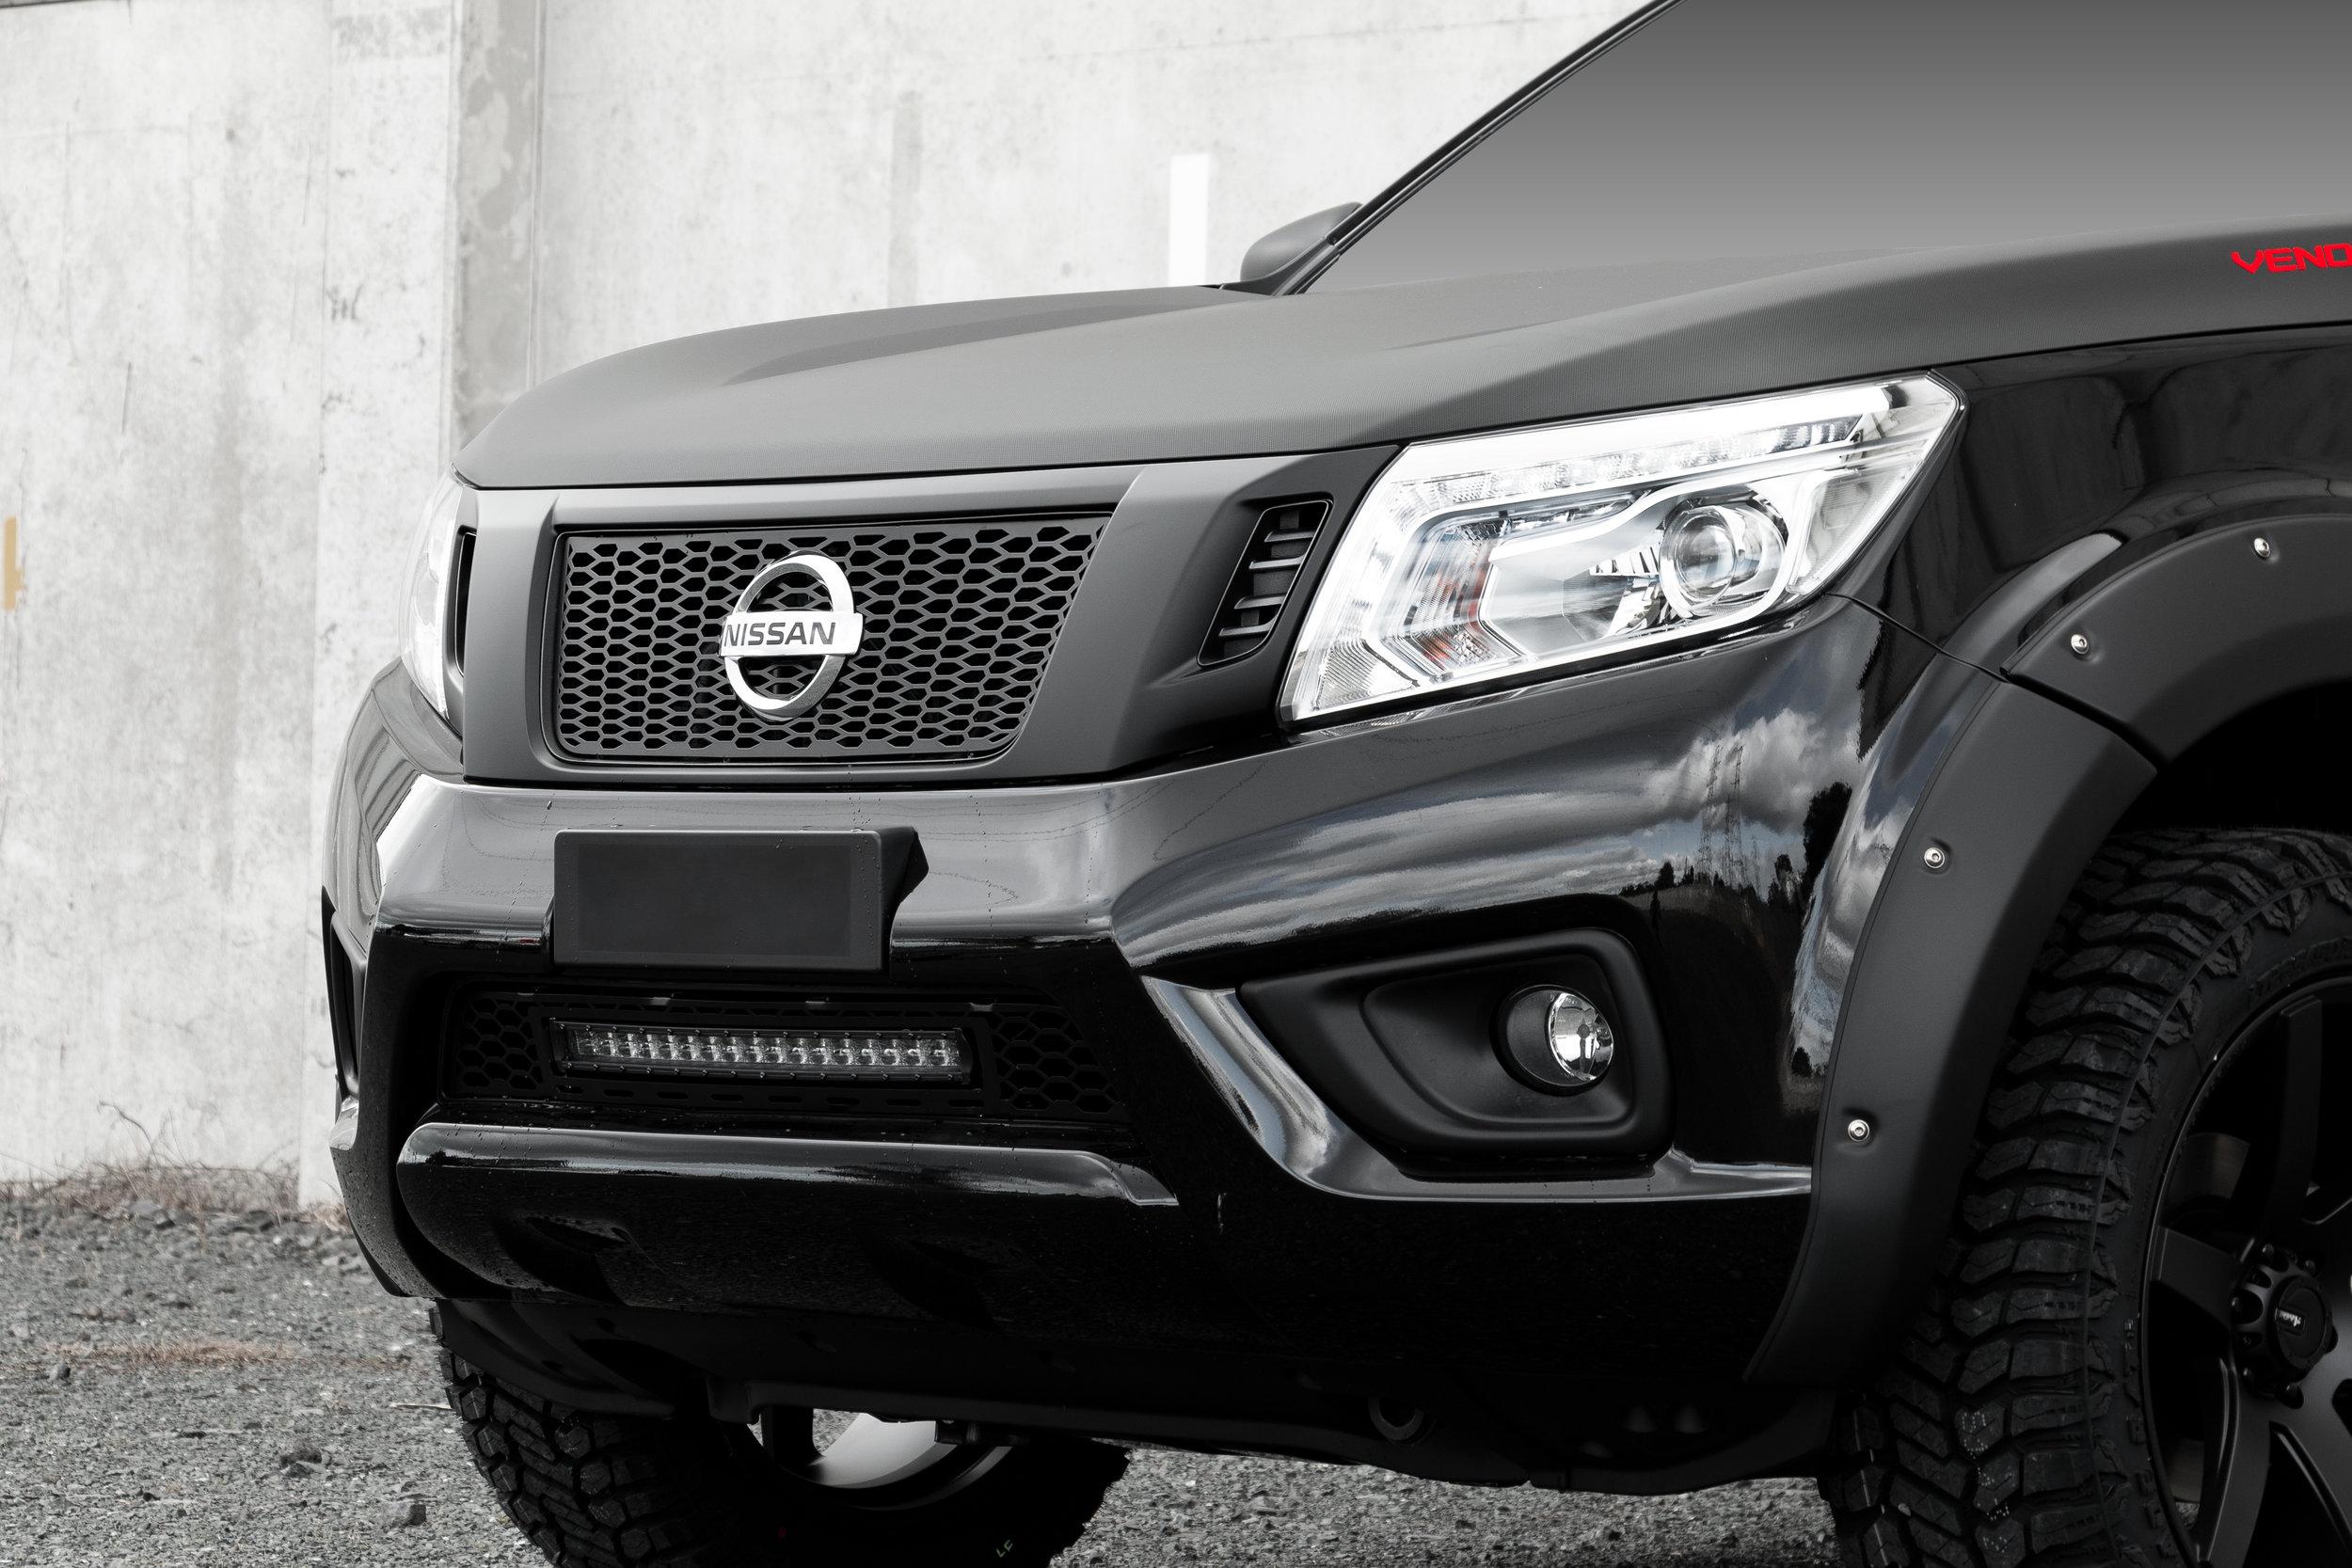 RVE-Nissan-Navara-Plain-Front-Grille-Mesh-Insert-with-Nissan-Badge.jpg